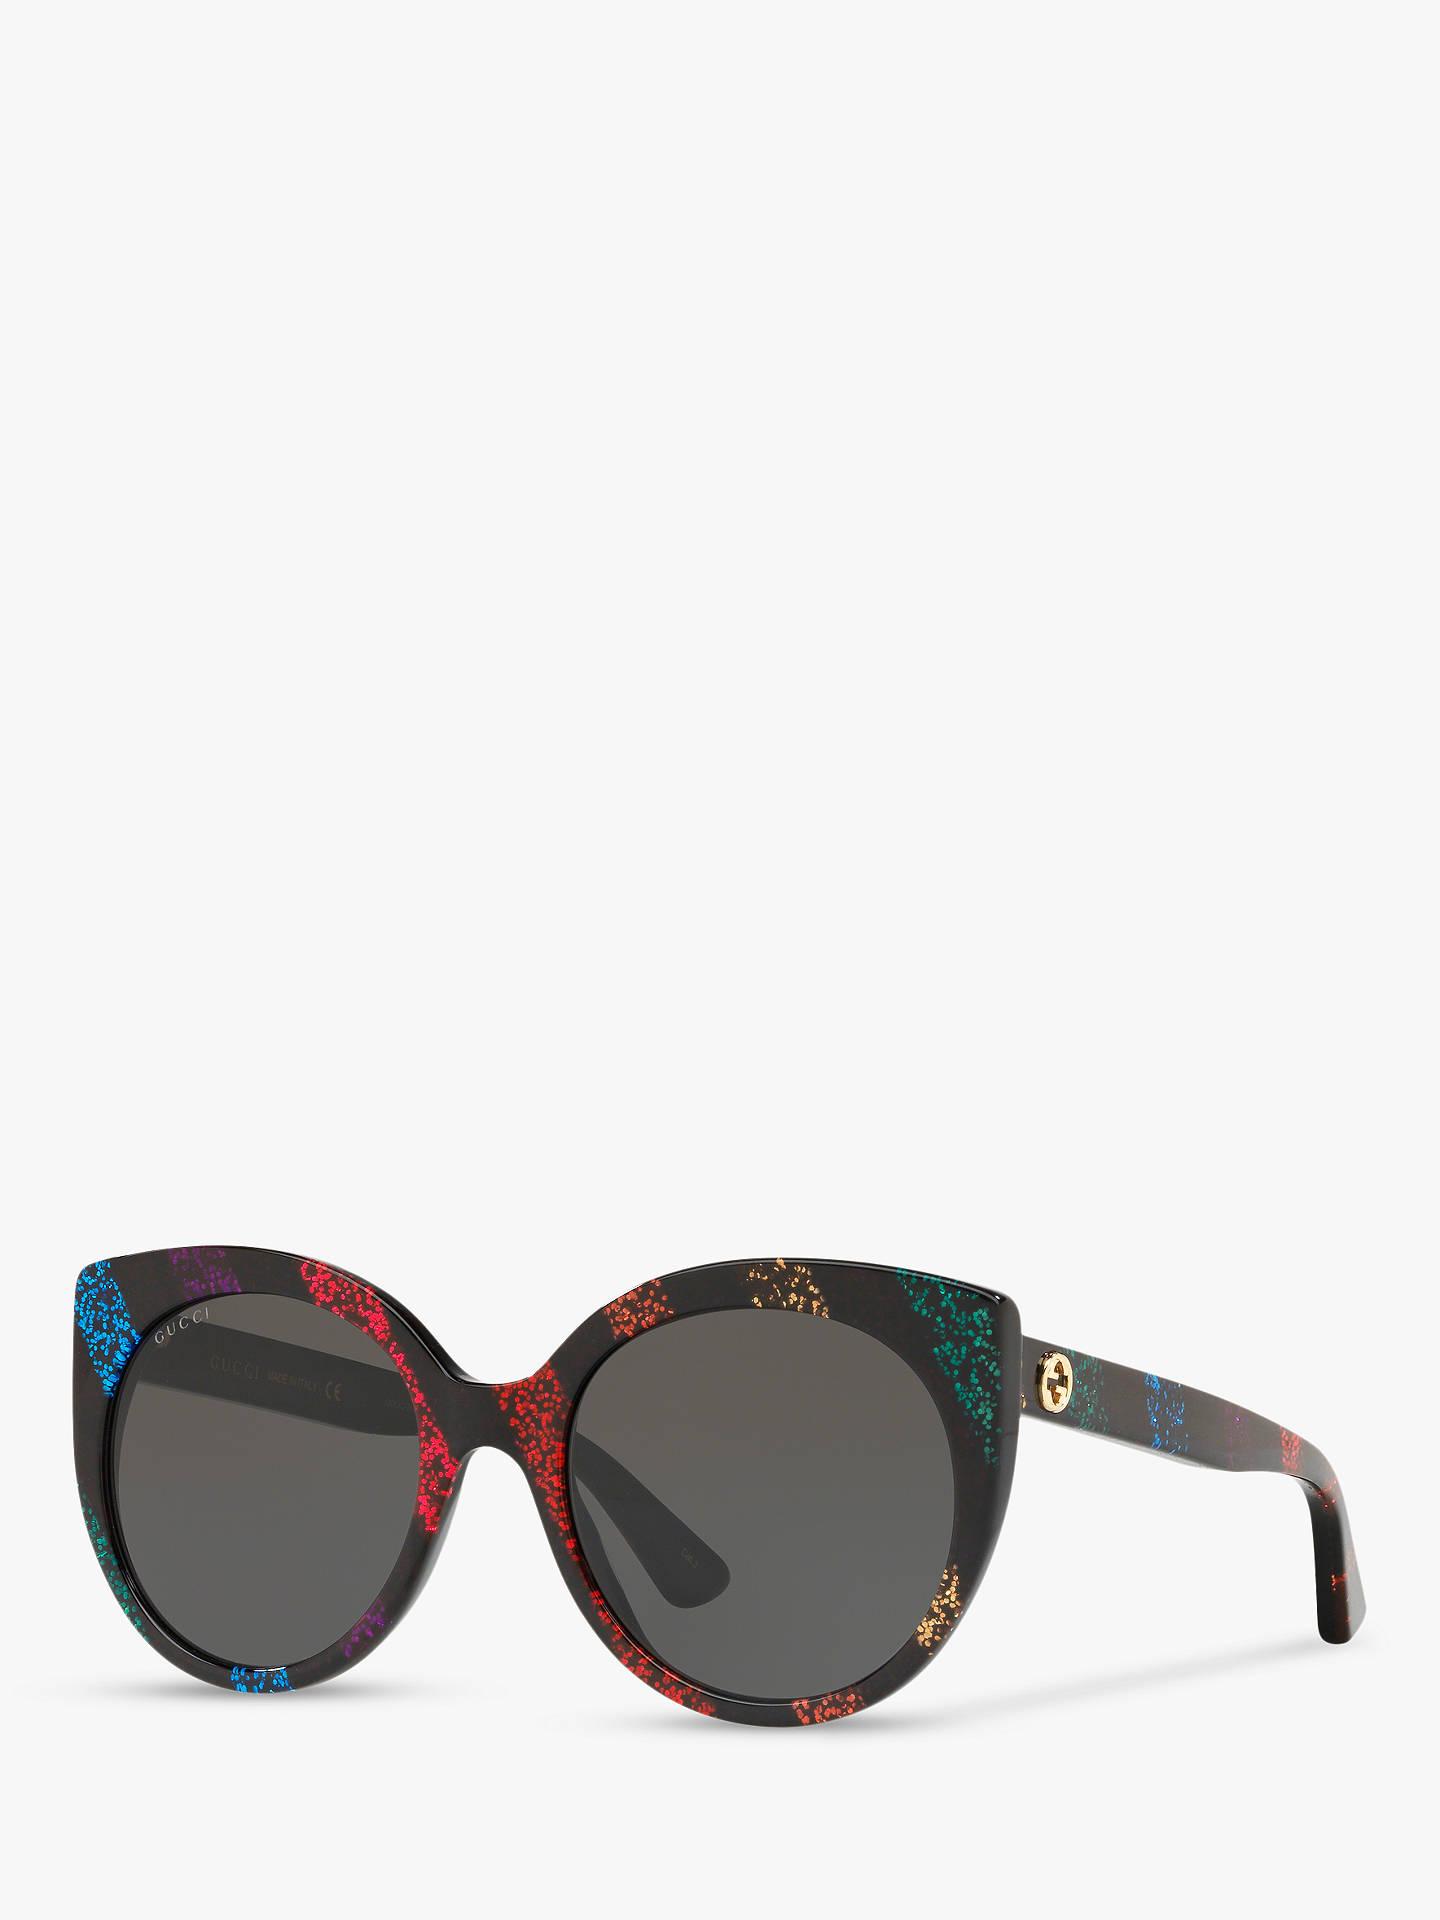 072a424e6d Gucci GG0325S Women s Cat s Eye Sunglasses at John Lewis   Partners